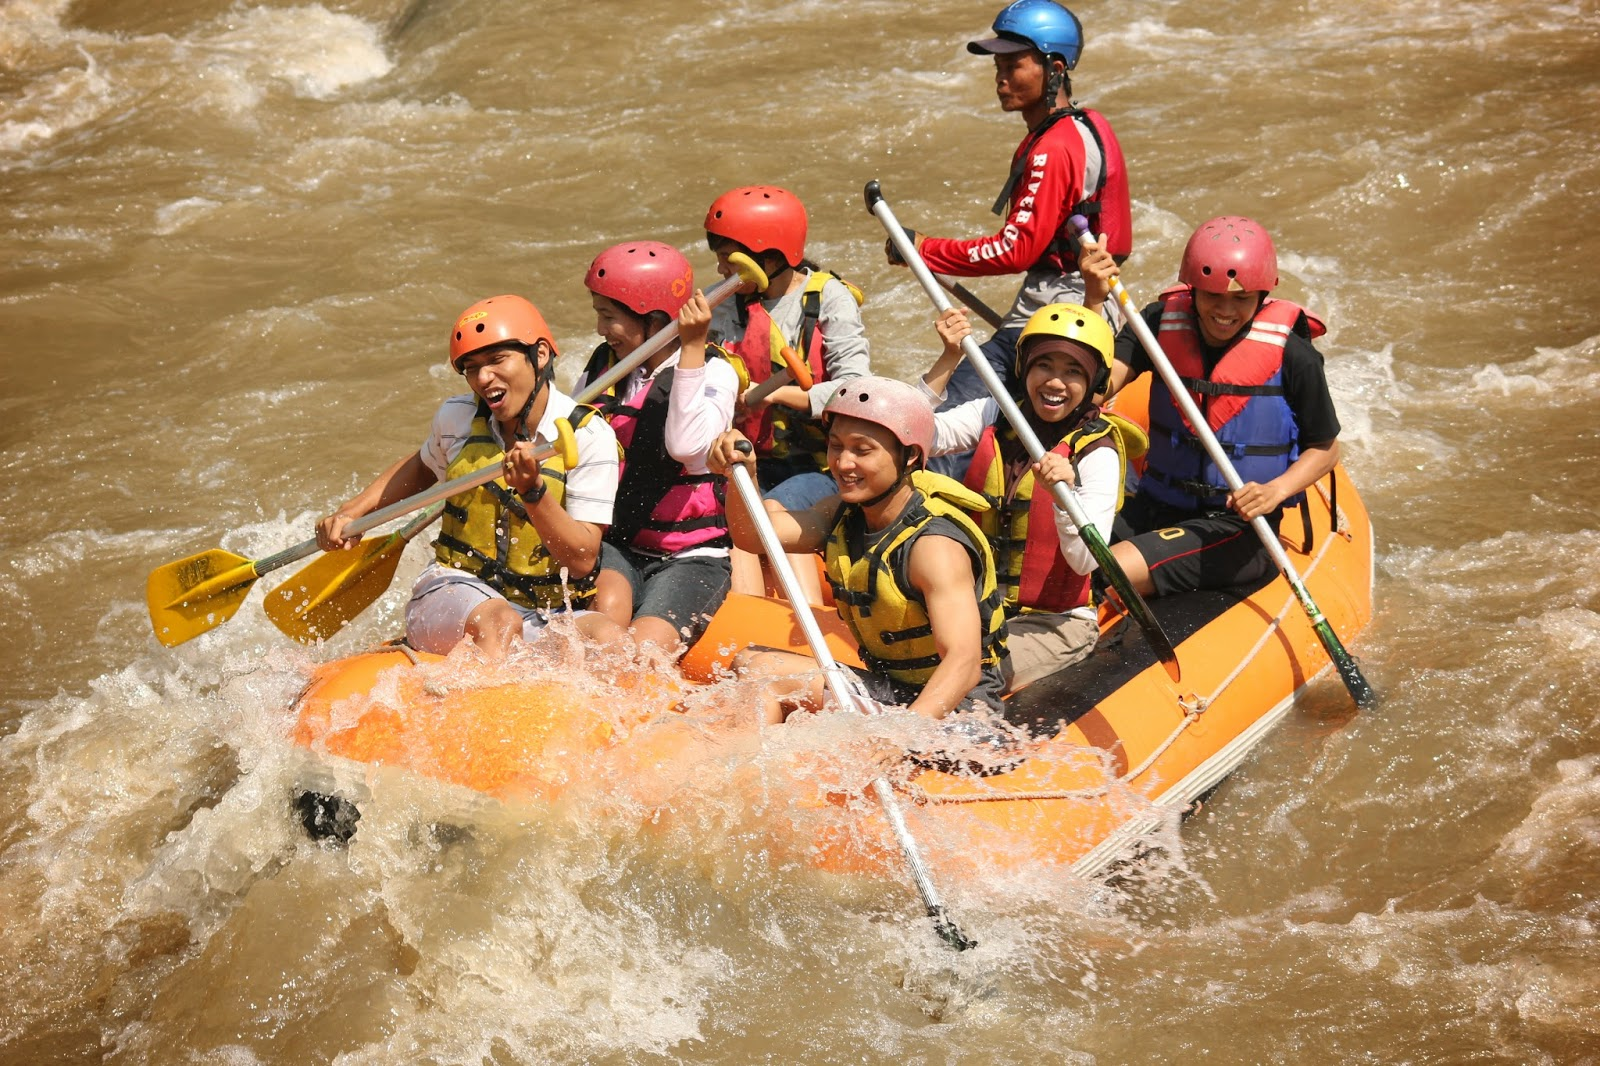 Wisata Rafting Sungai Elo Magelang Vicky Surya Terletak Kabupaten Dekat